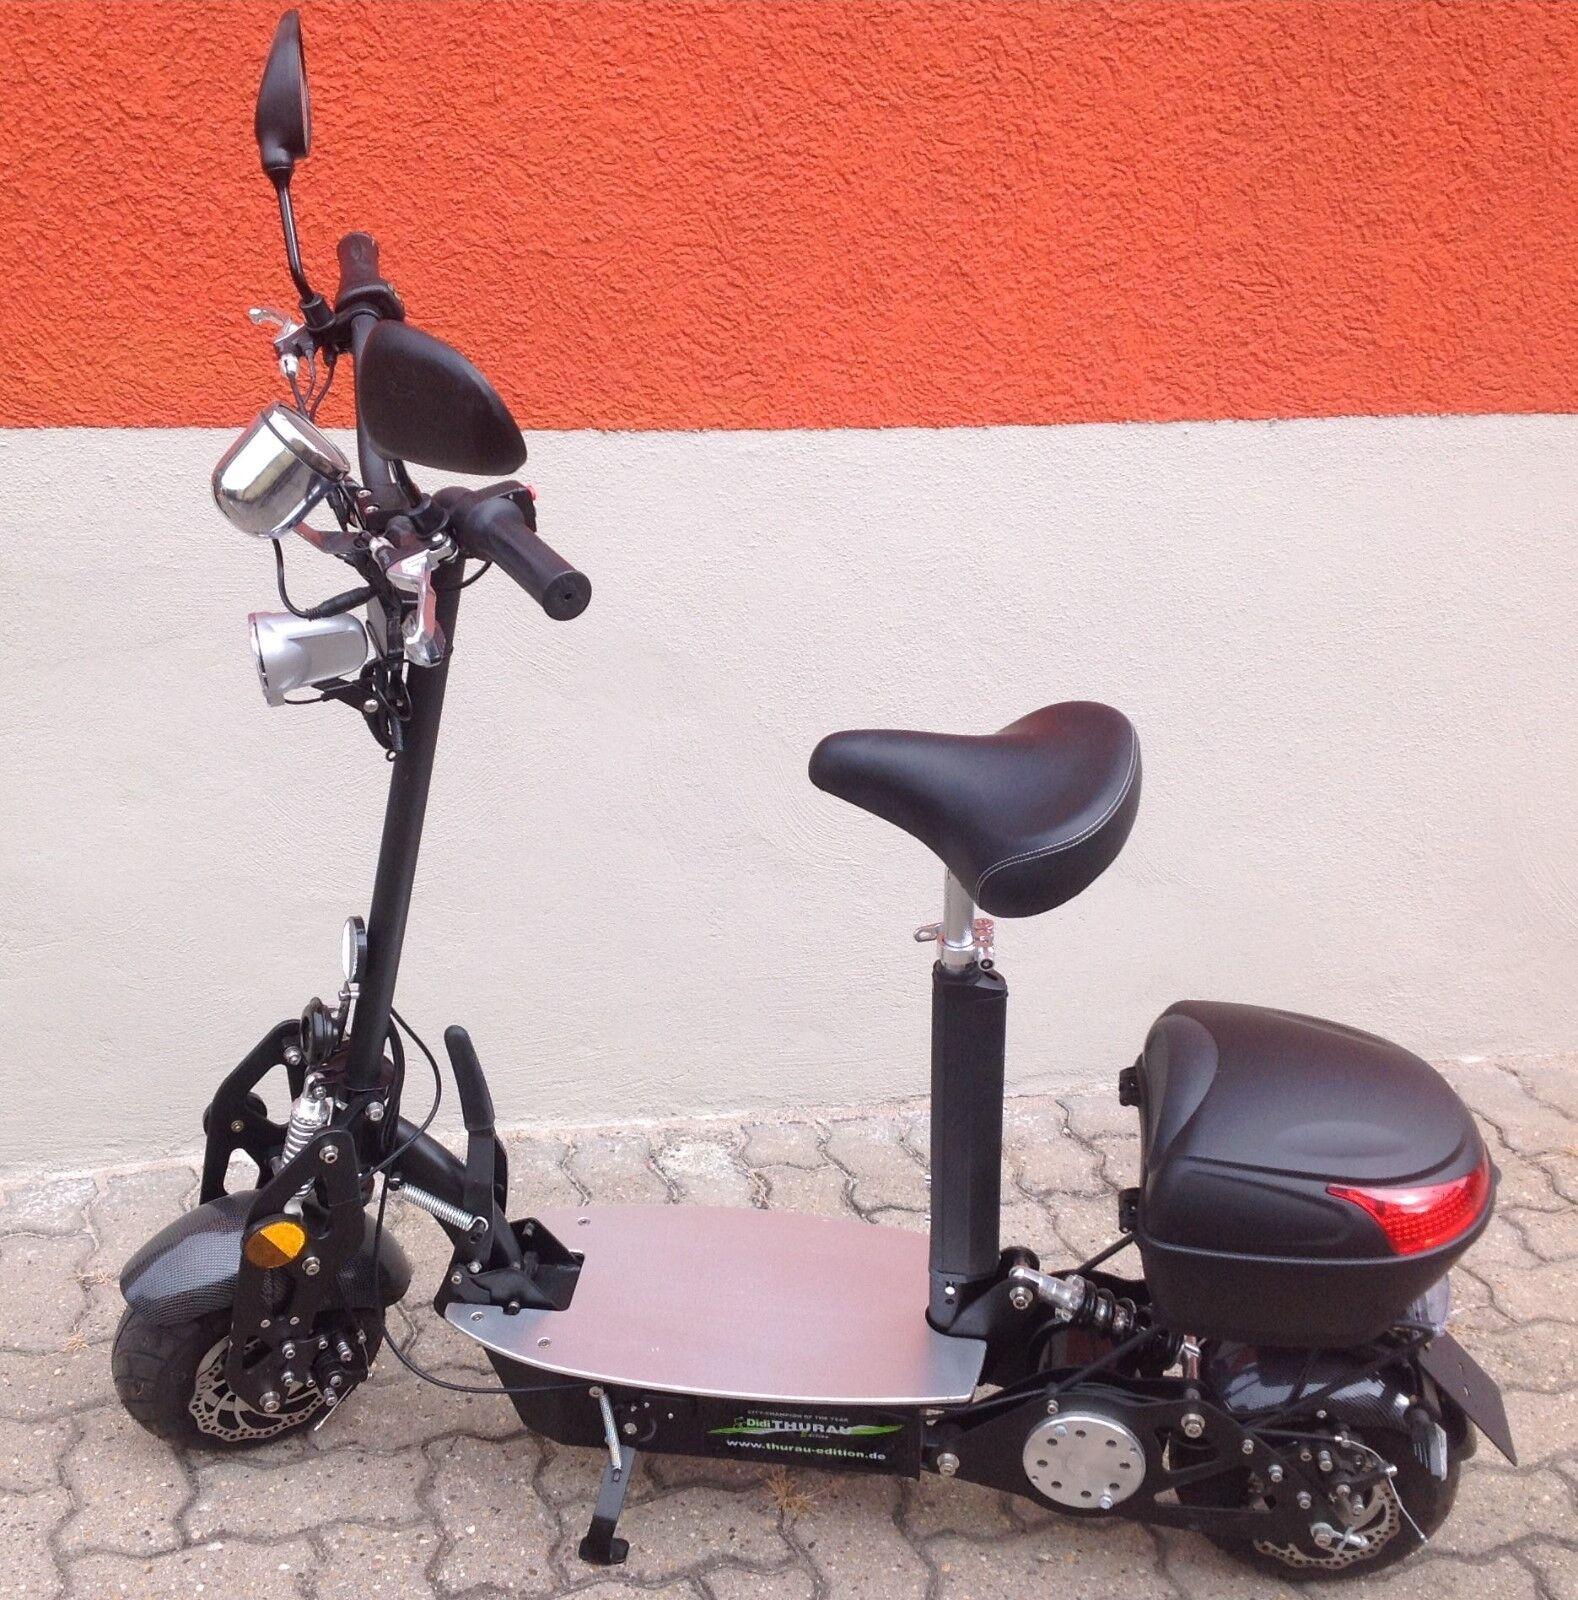 City-Roller, Zulassung, Blinkanlage, Topcase, Korb, neuestes Model